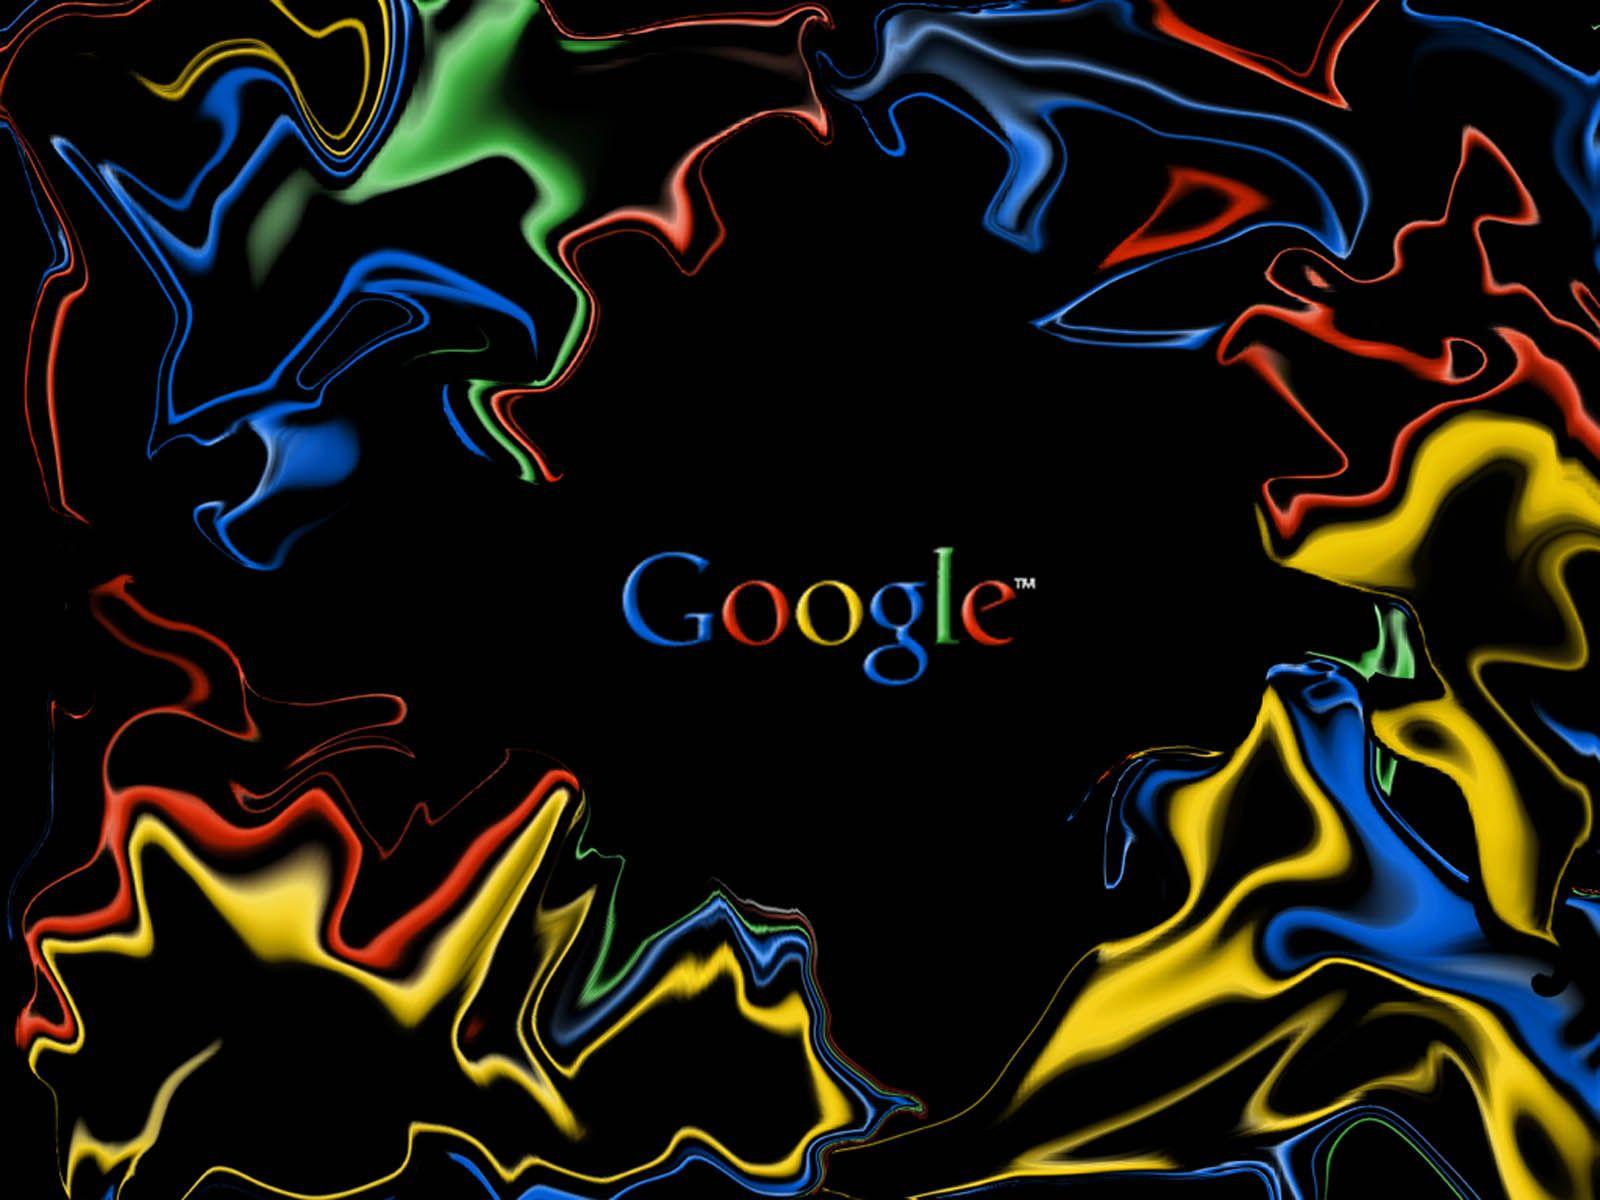 google wallpaper picture amazing